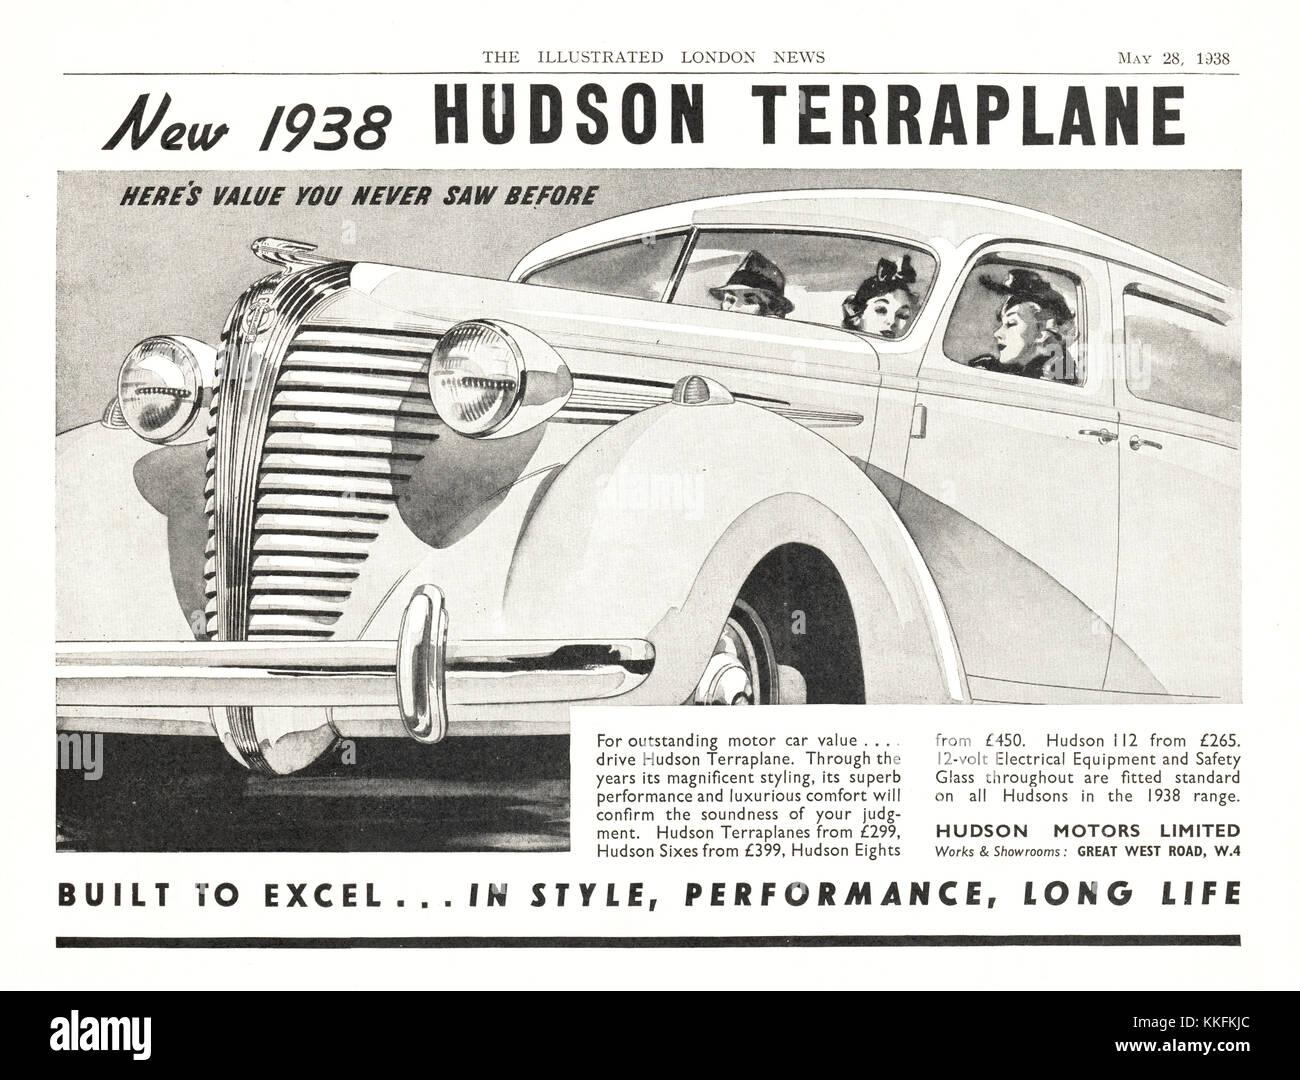 1938 UK Magazine Hudson Terraplane Car Advert Stock Photo: 166916468 ...